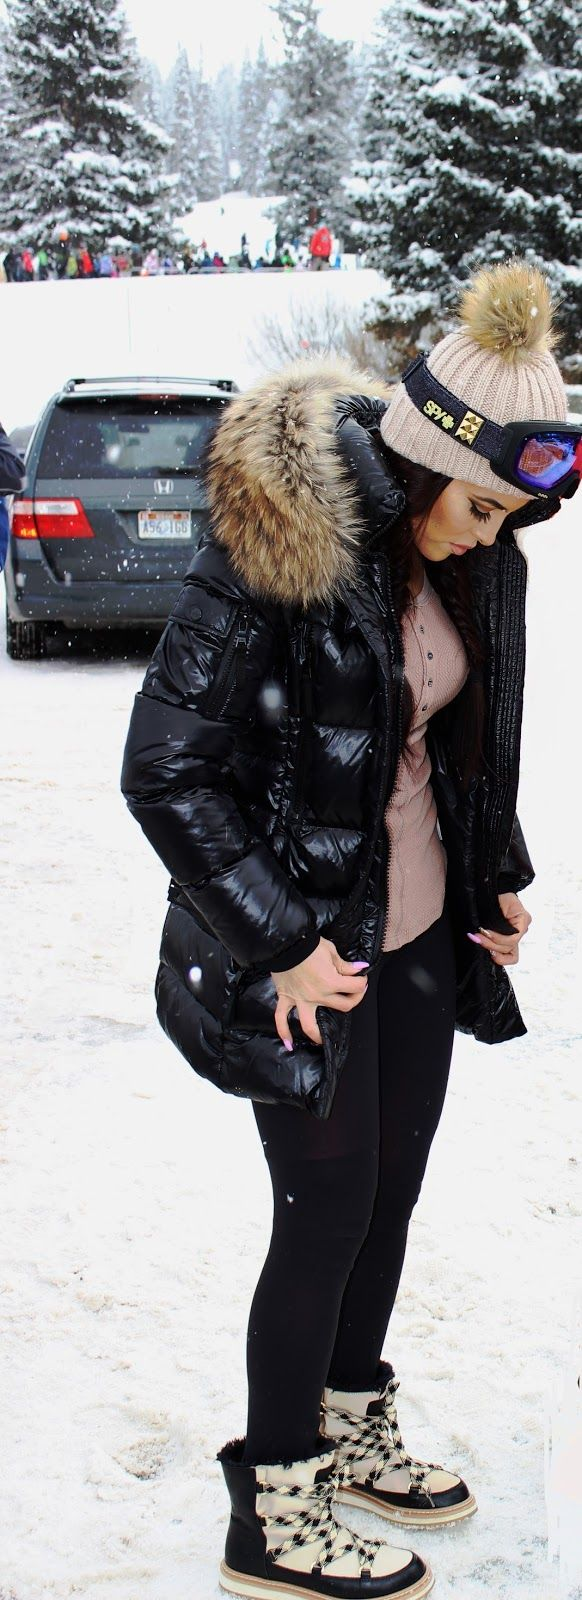 SARAH & ELIZABETH : Snowboarding trip kate spade samira, free people ski lodge, Lululemon, sam., leggings millennium, black patent down jacket, fur hoody, black plaid snow boots. fur pom pom. all black and nude.